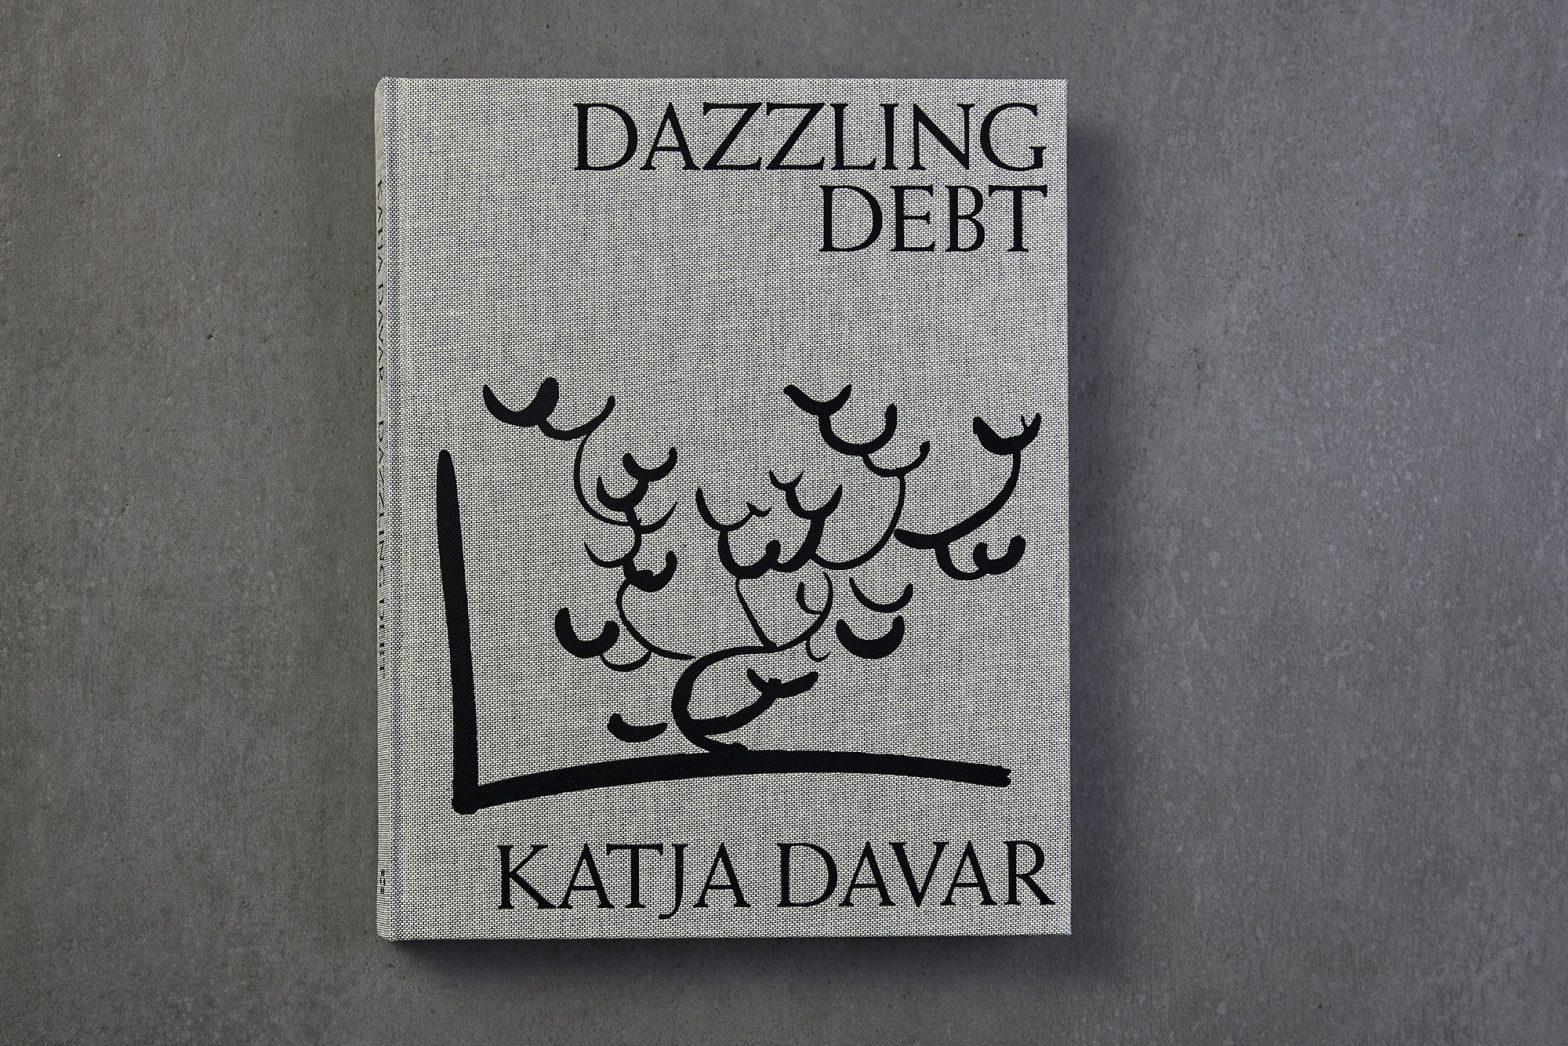 Dazzling Debt